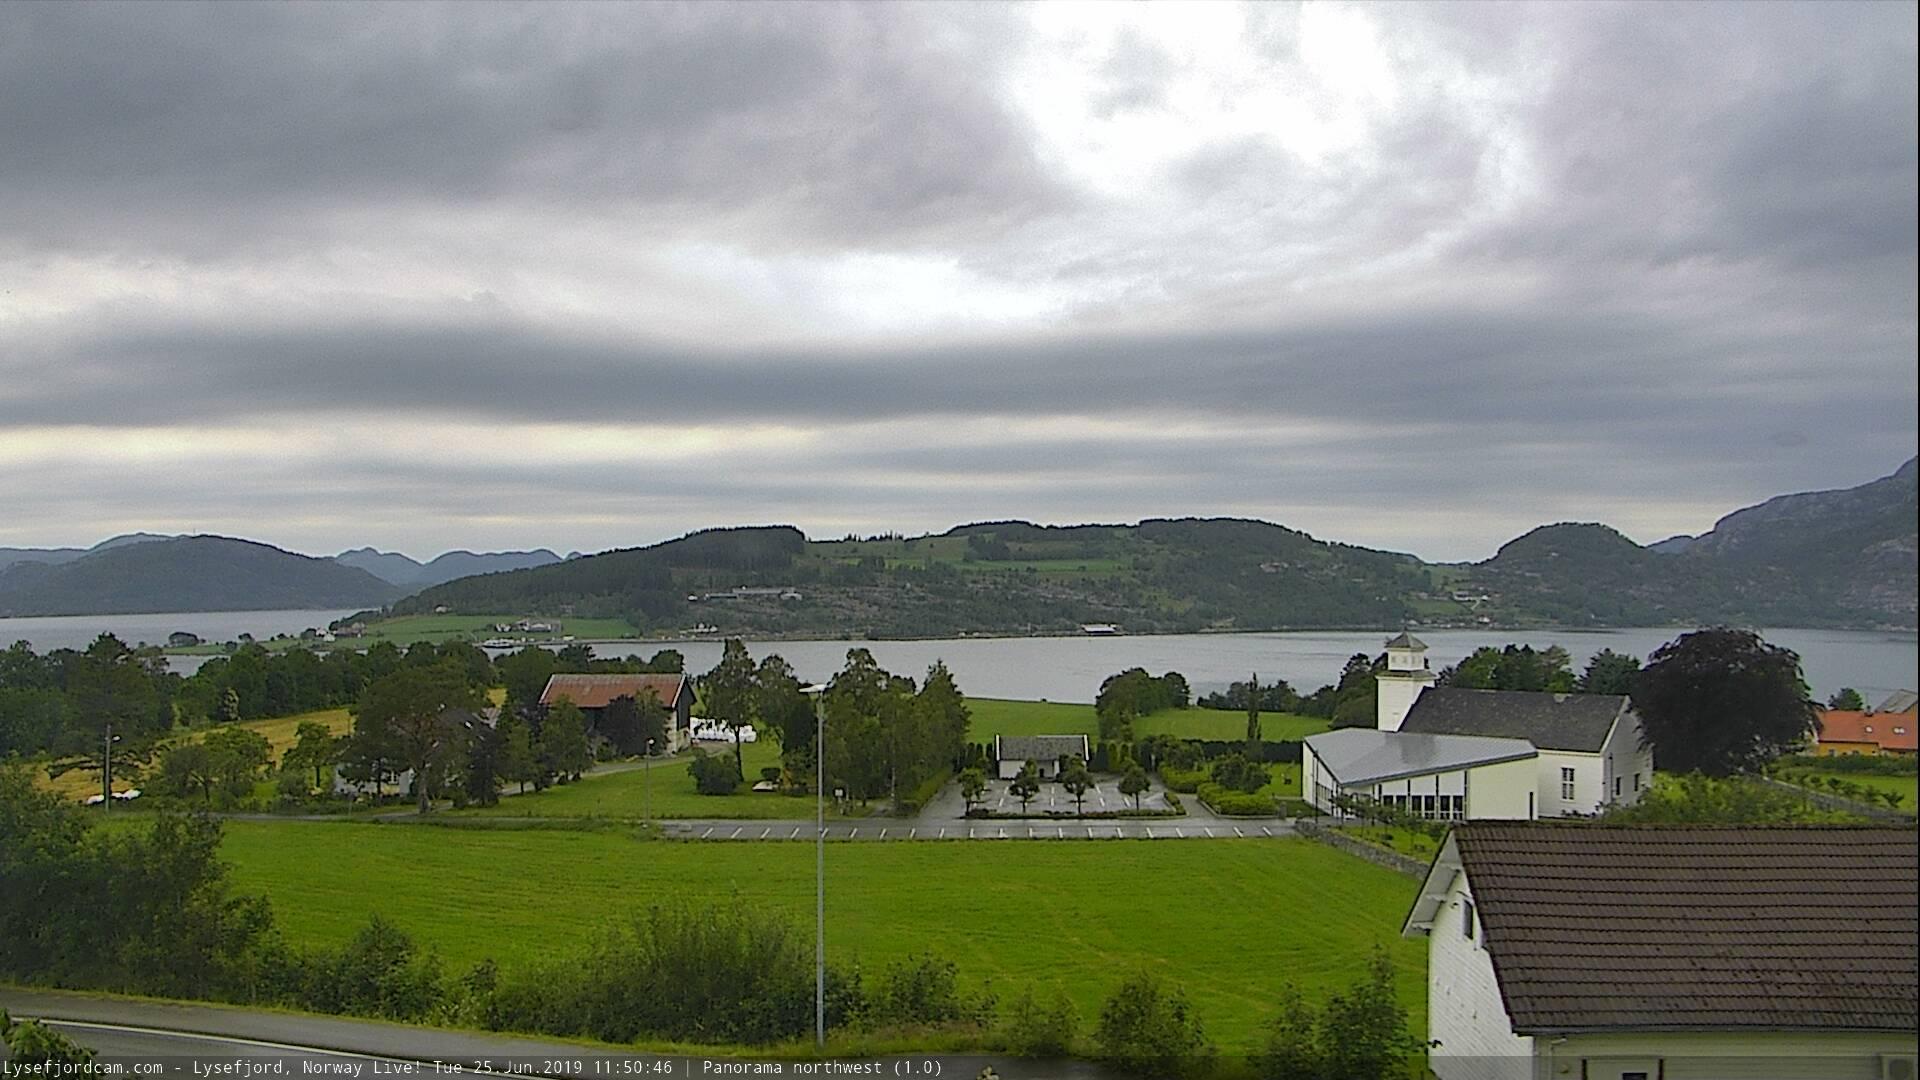 Webkamera Lysefjorden › North-West: Panorama northwest